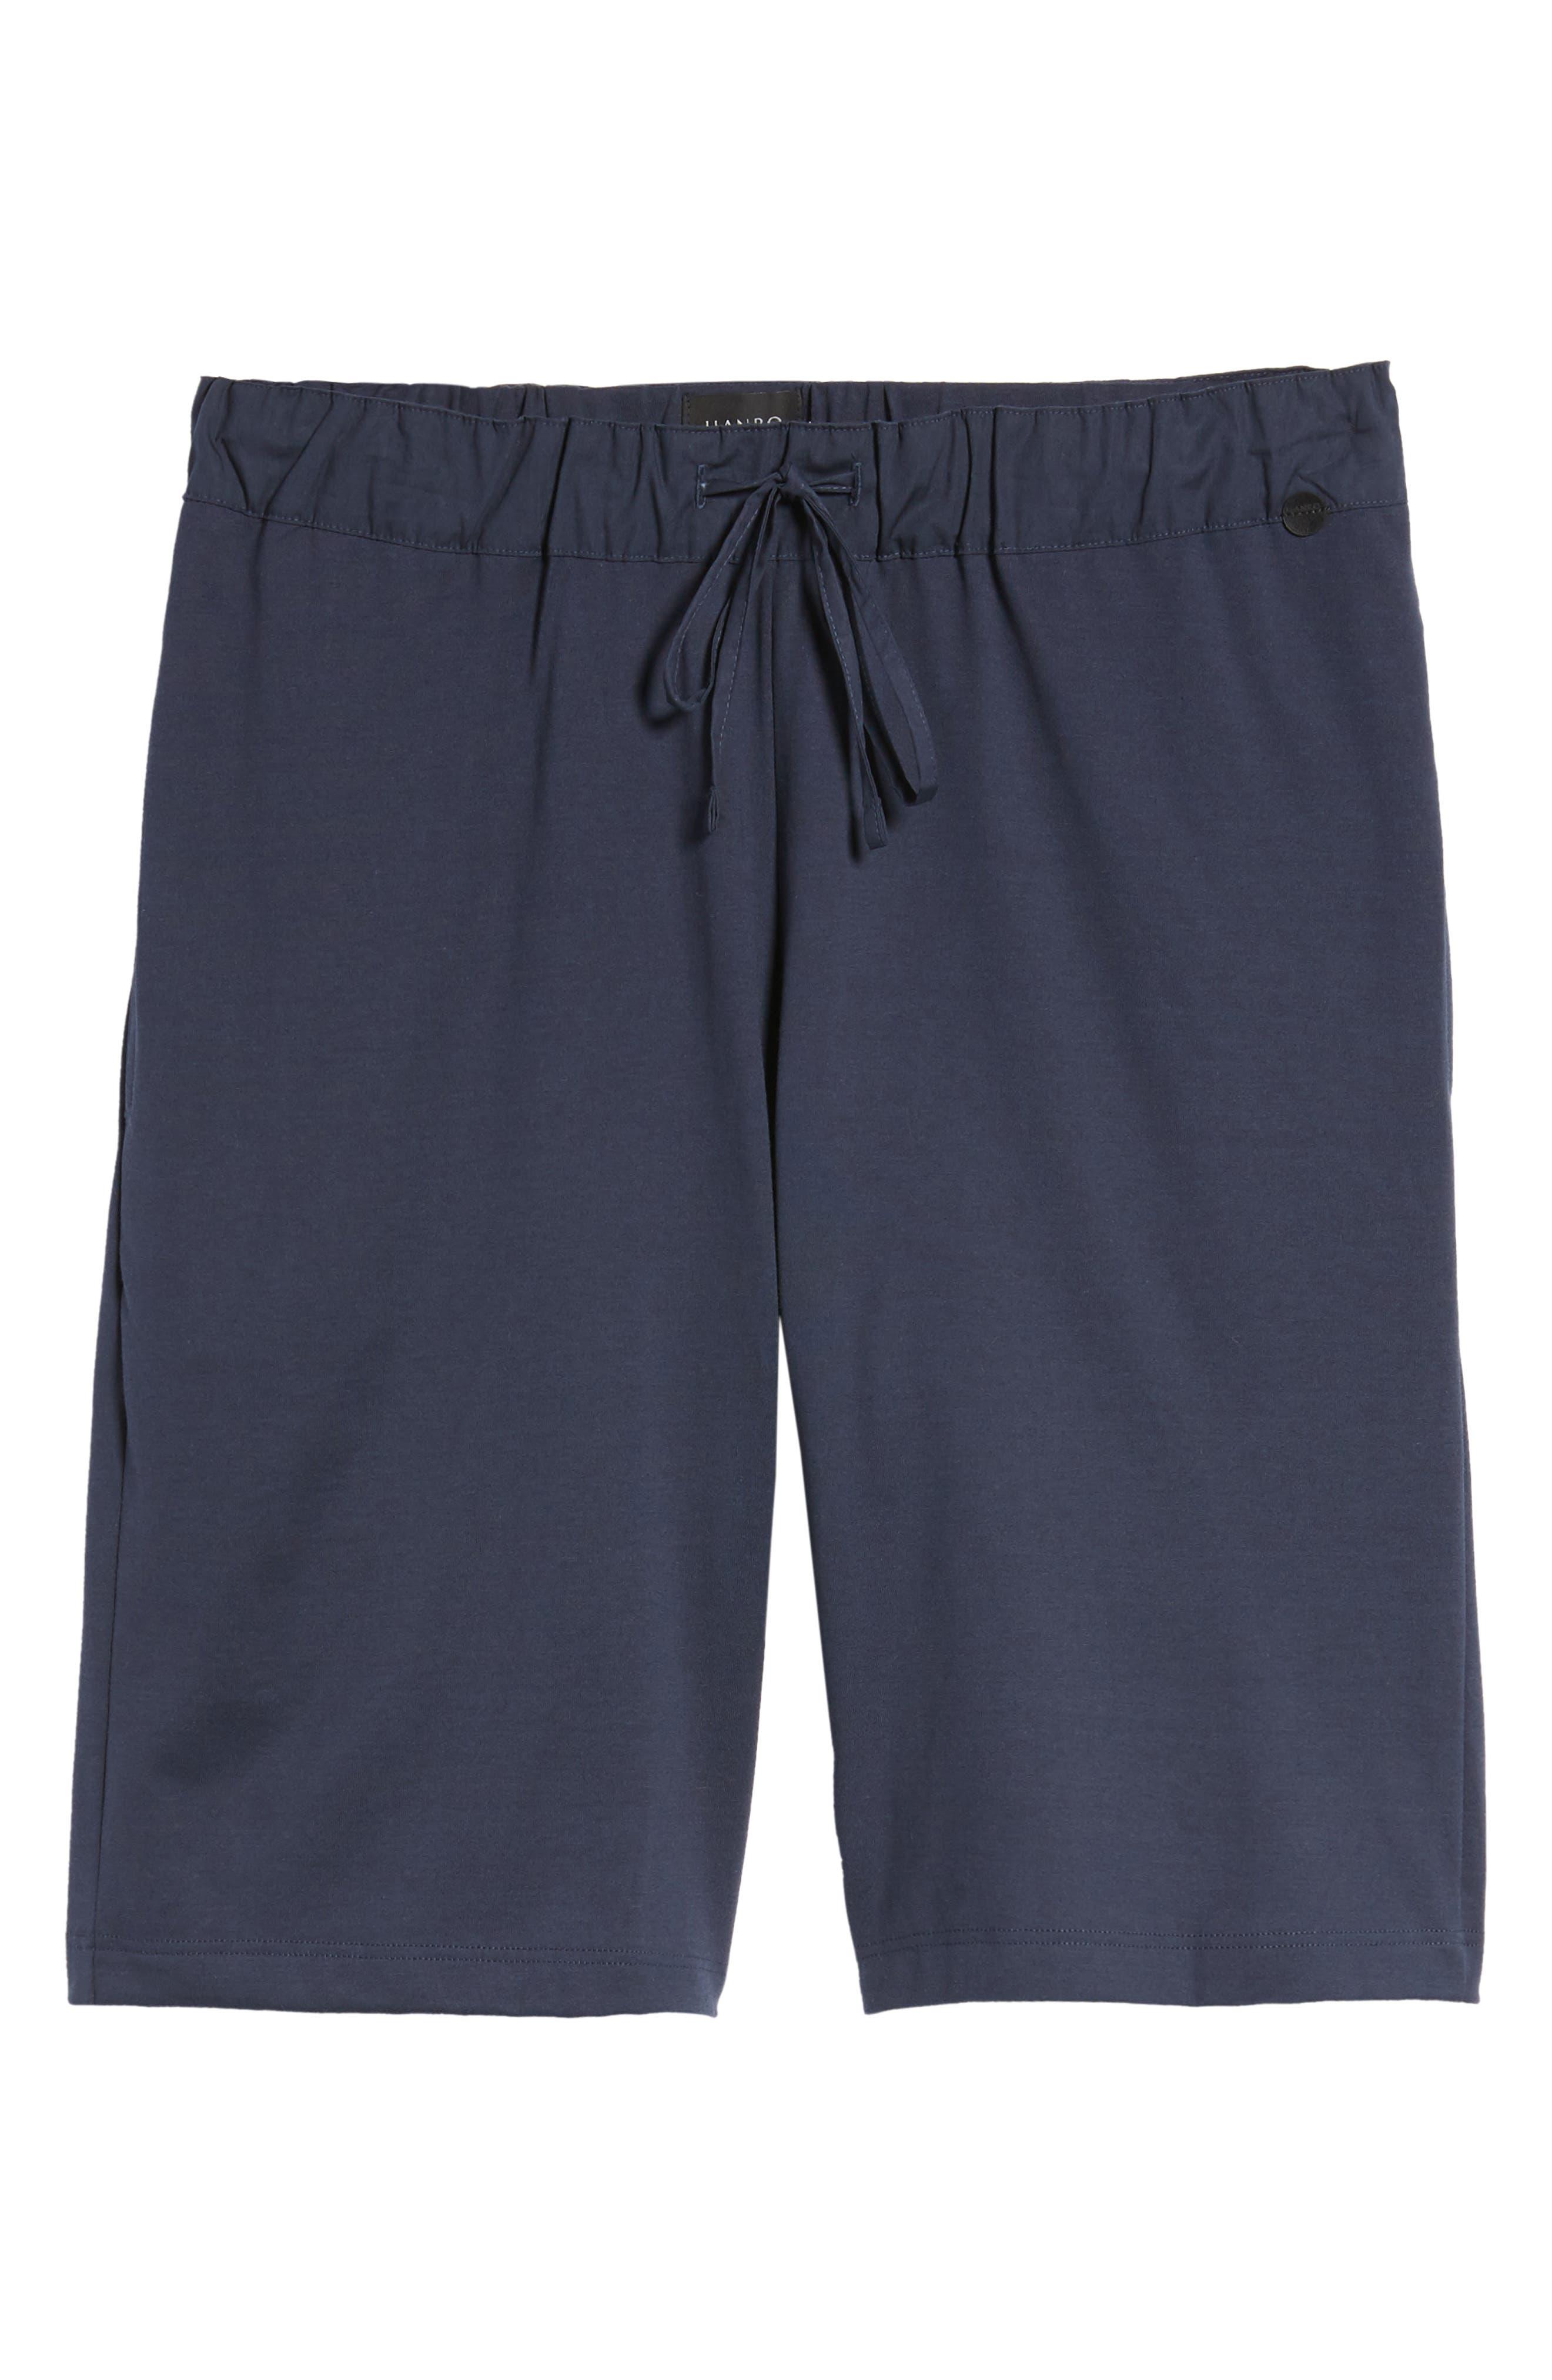 Night & Day Knit Shorts,                             Alternate thumbnail 6, color,                             BLACK IRIS